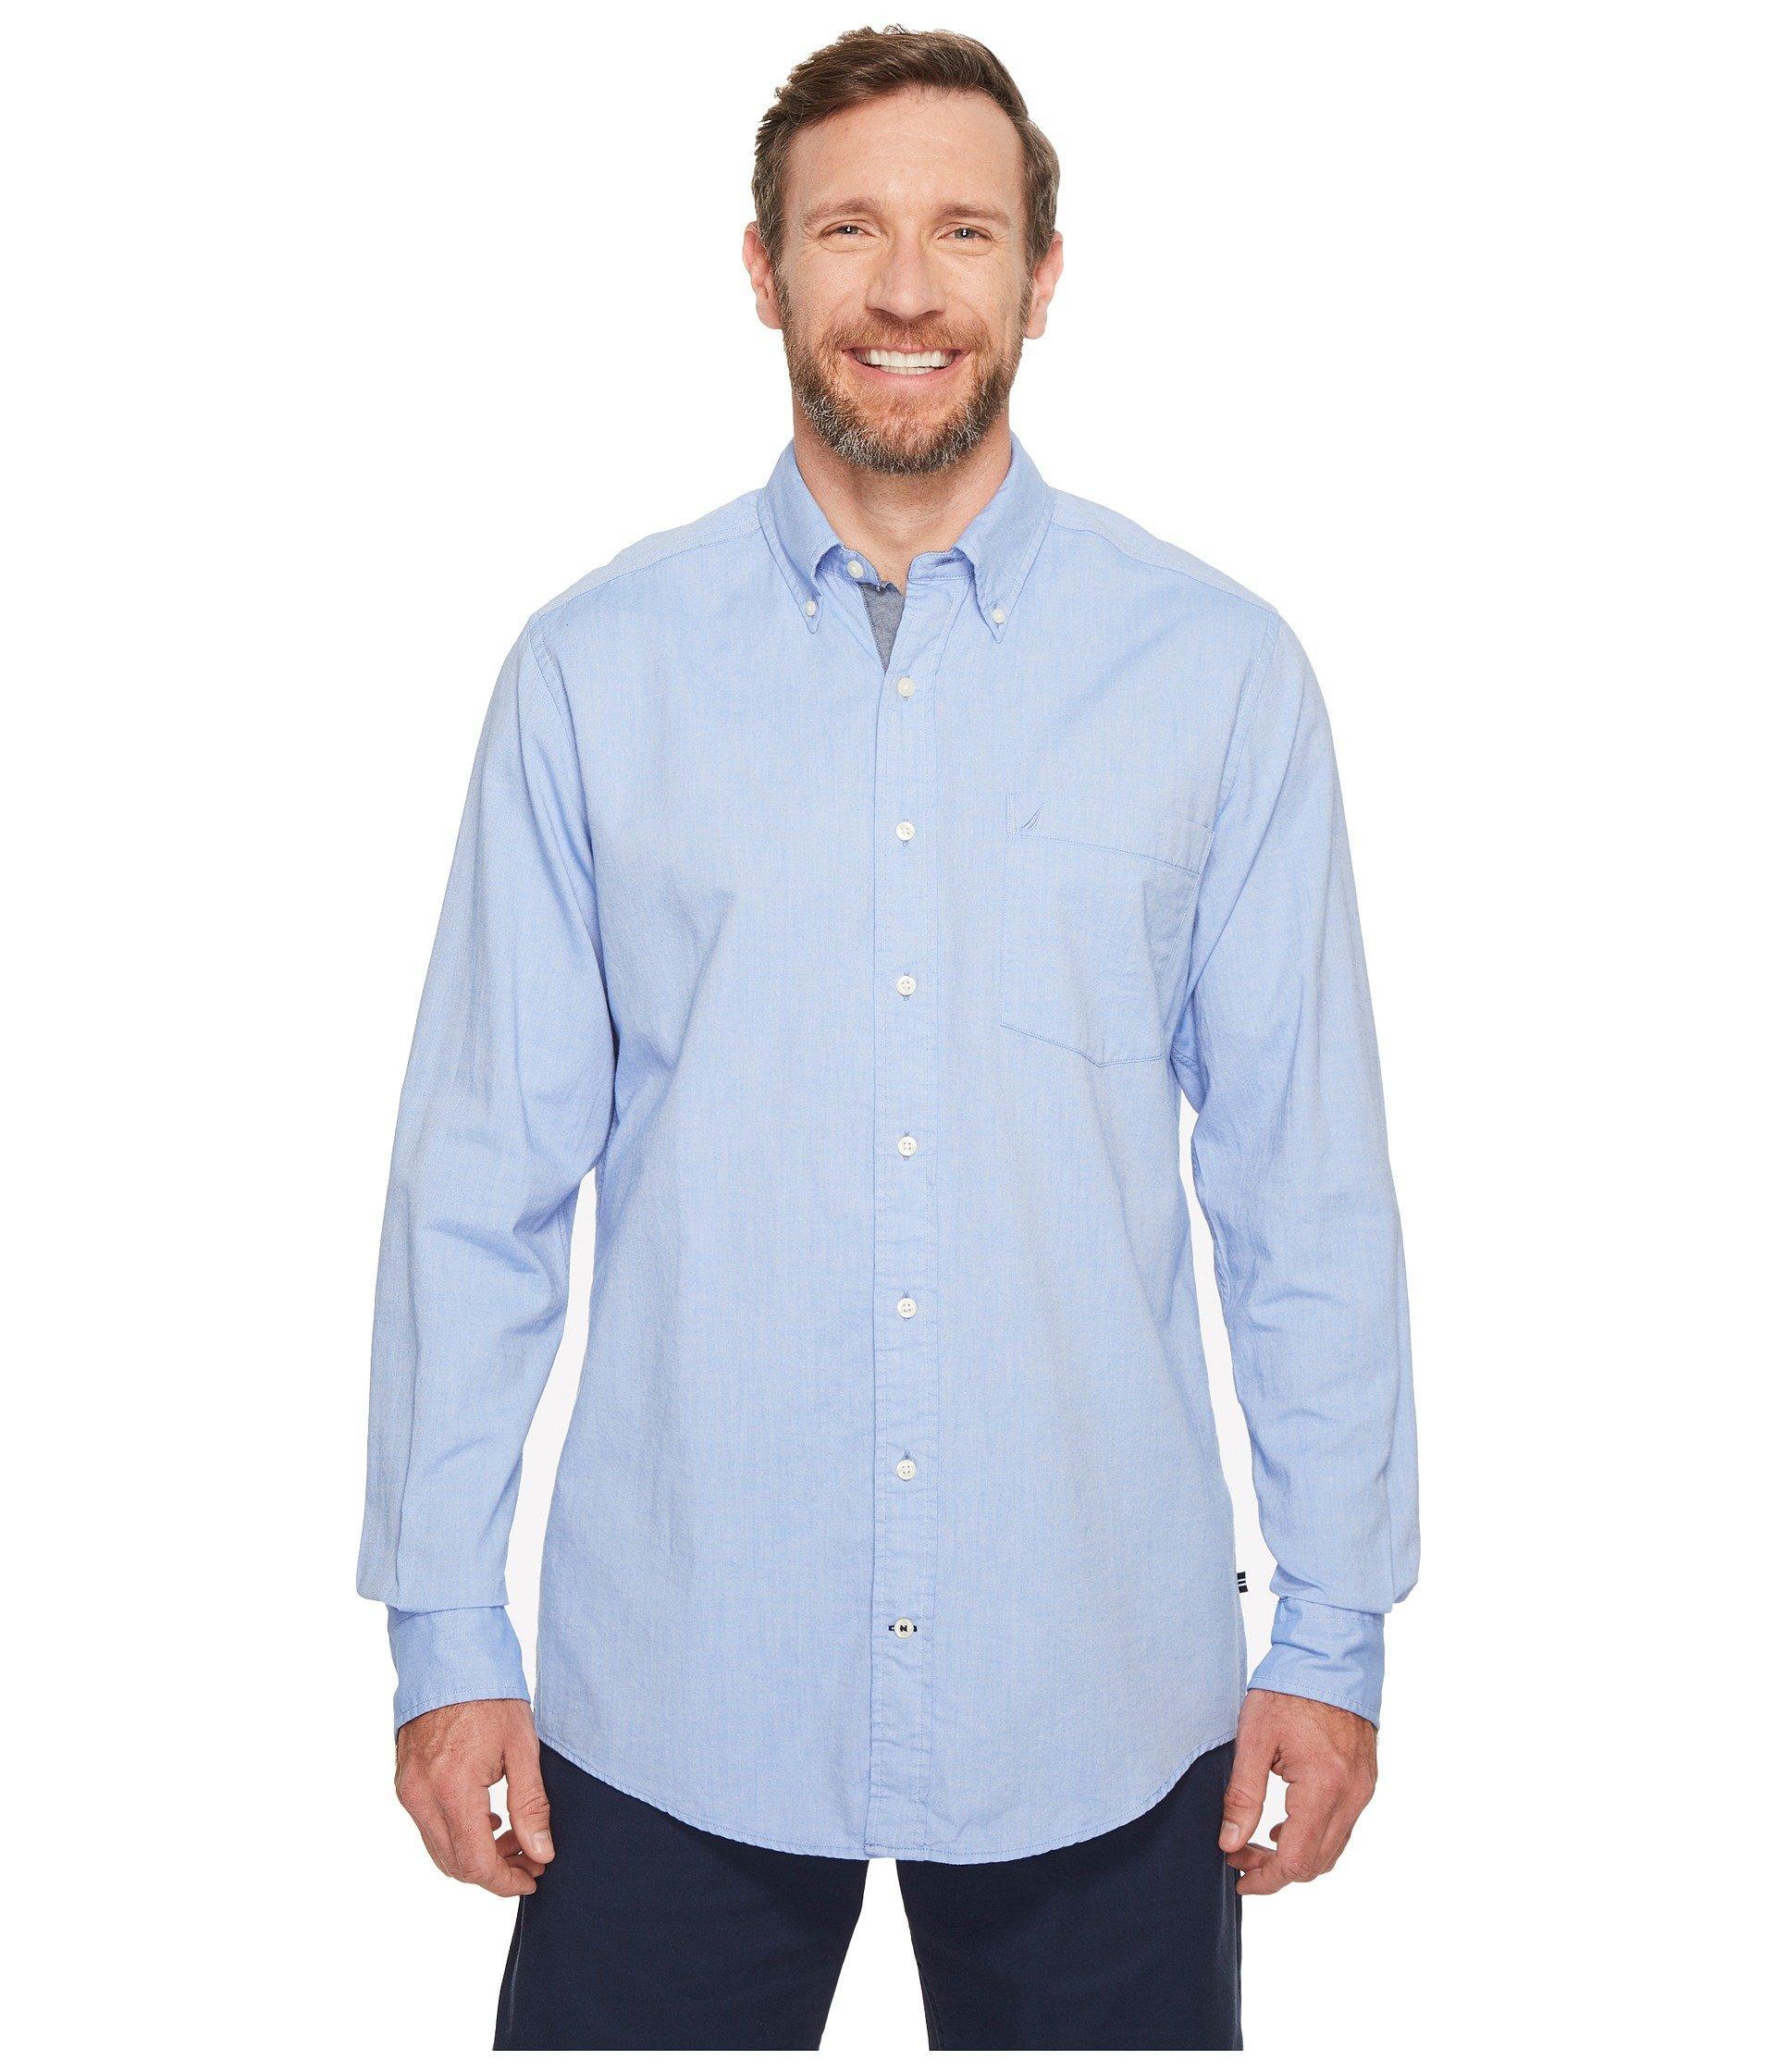 0601ec140f7833 Lyst - Nautica Big Tall The Hitch Long Sleeve Oxford Woven Shirt ...